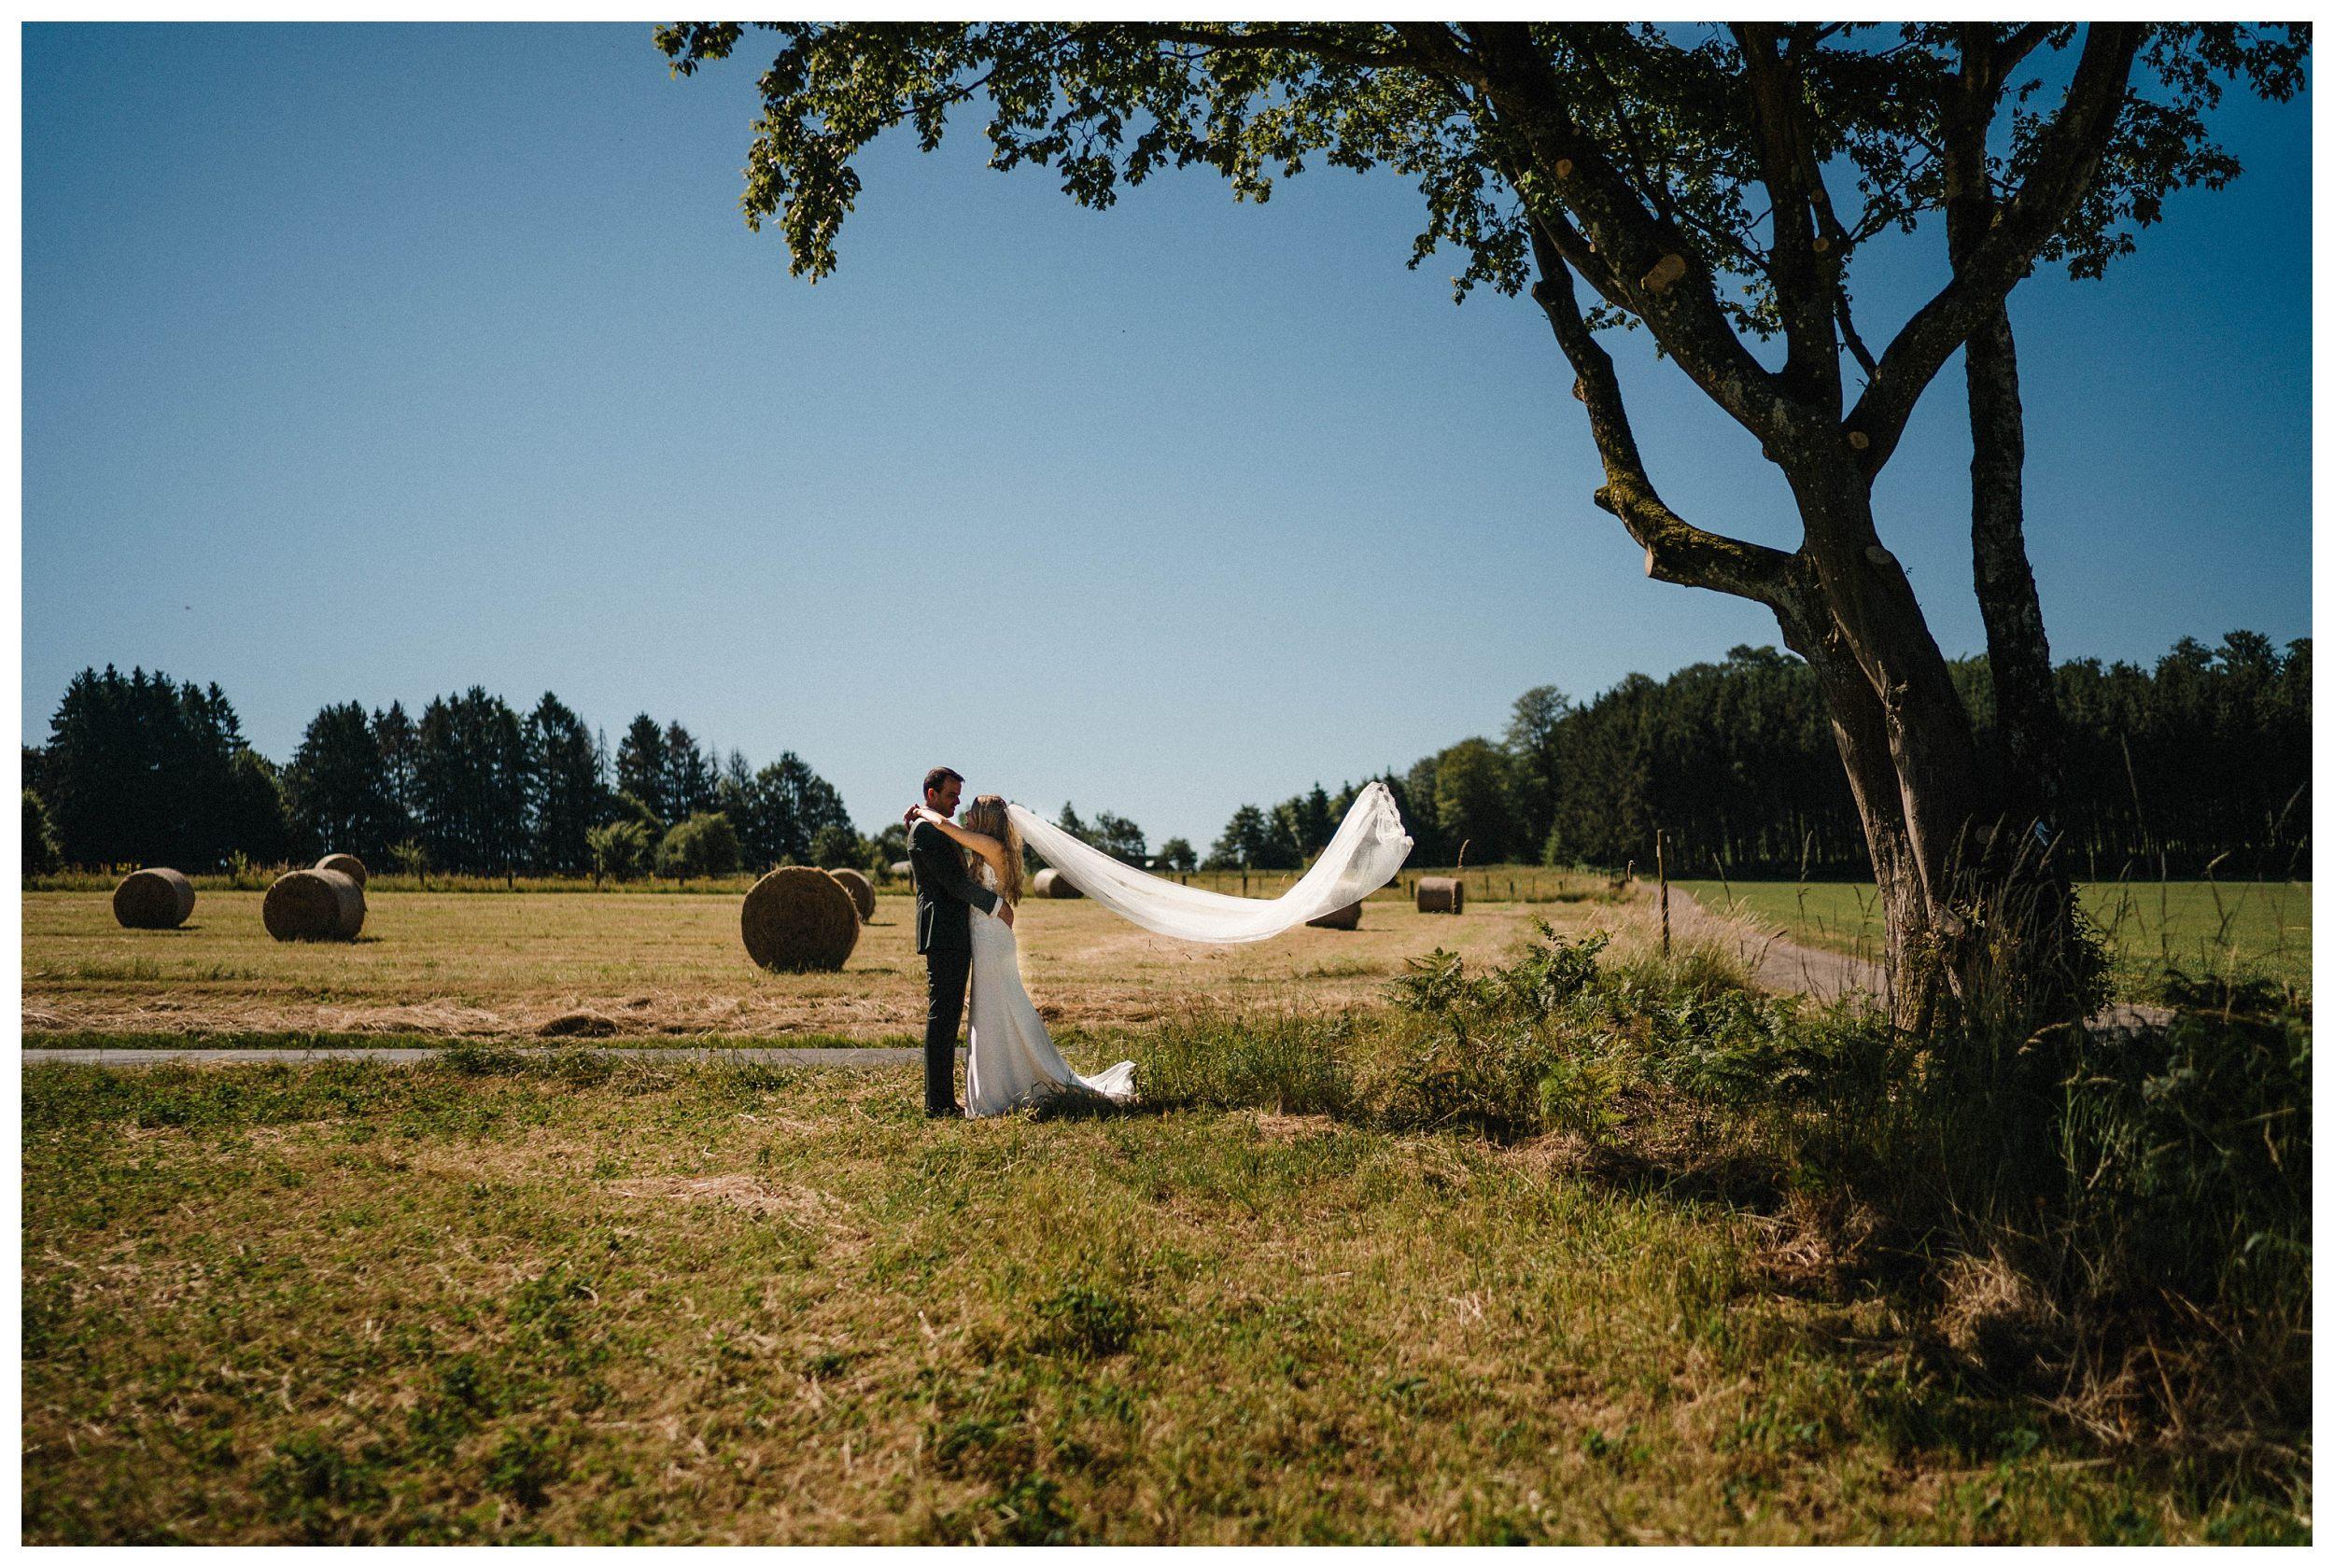 huwelijksfotograaf bruidsfotograaf destinationwedding huwelijksfotografie in ardennen nederland (35).jpg